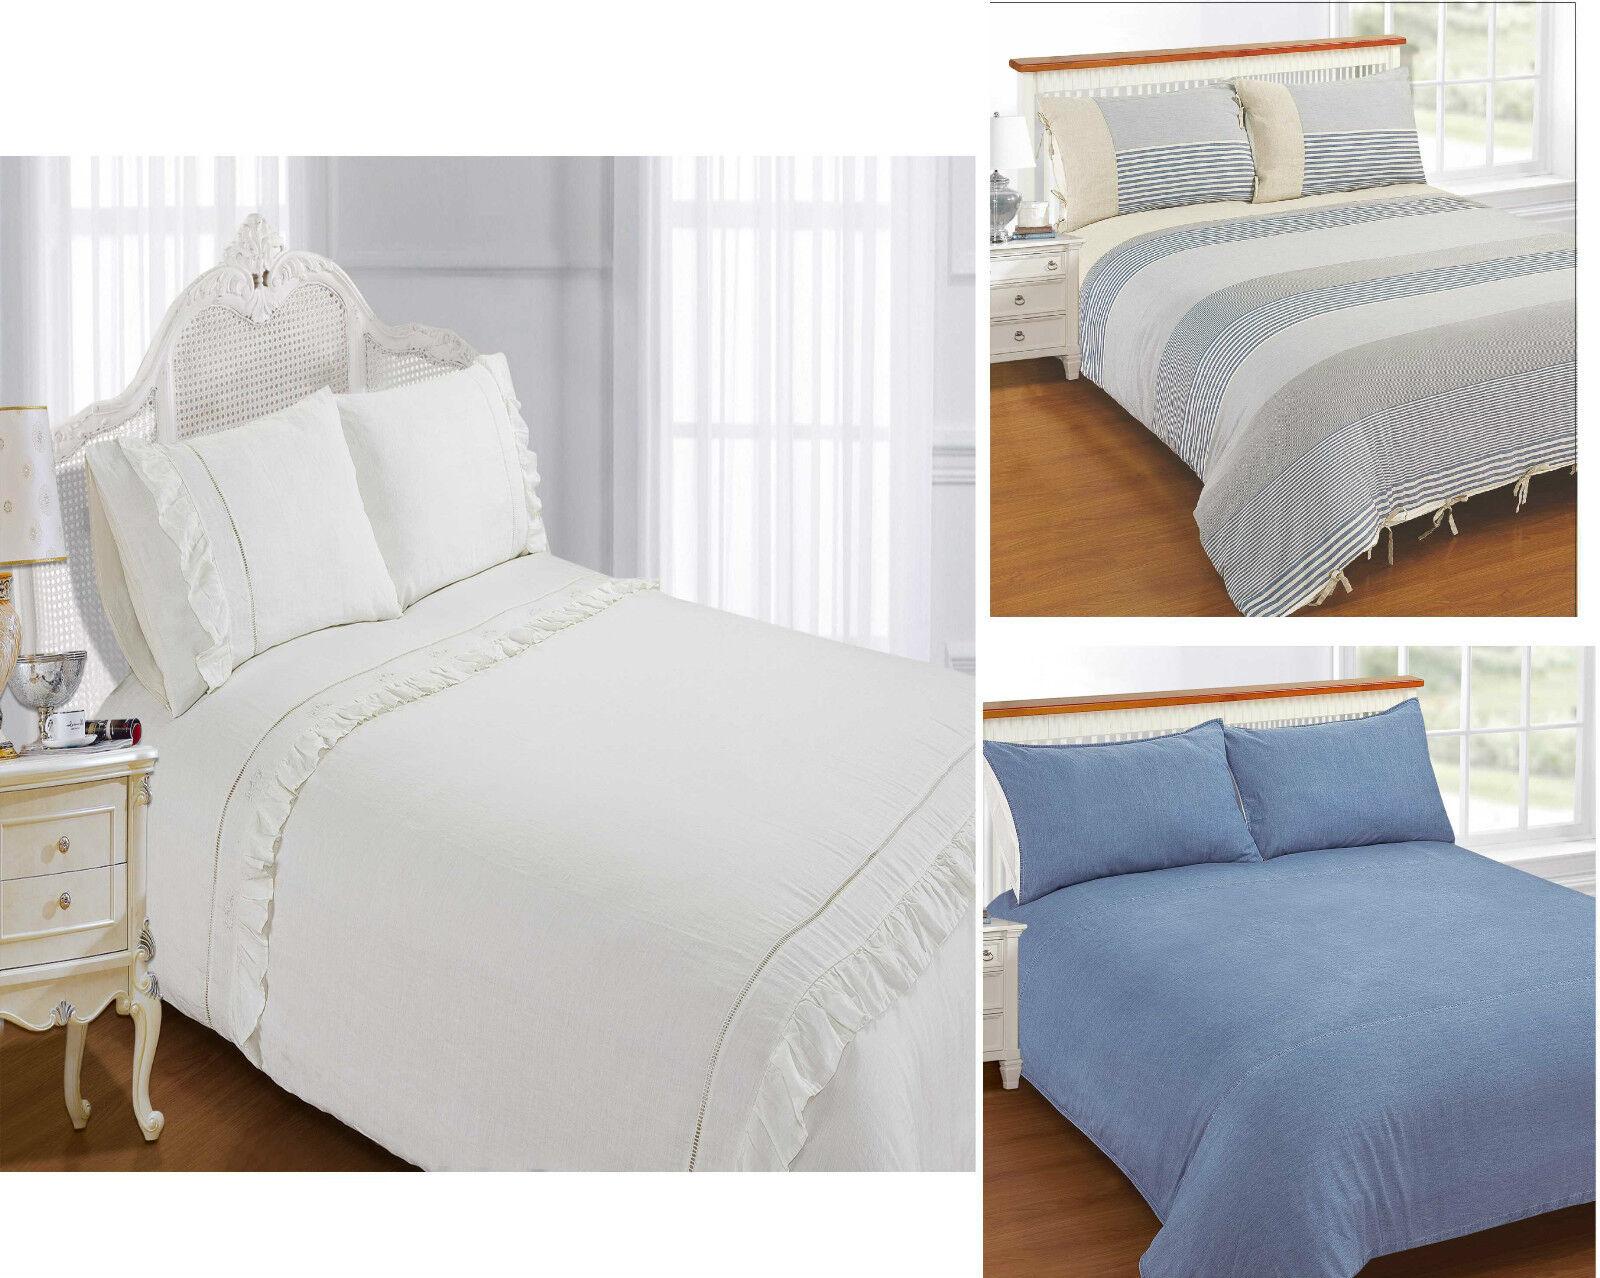 Exclusive Superior Designer 100% Cotton Linen Duvet   Quilt Cover Bedding Set